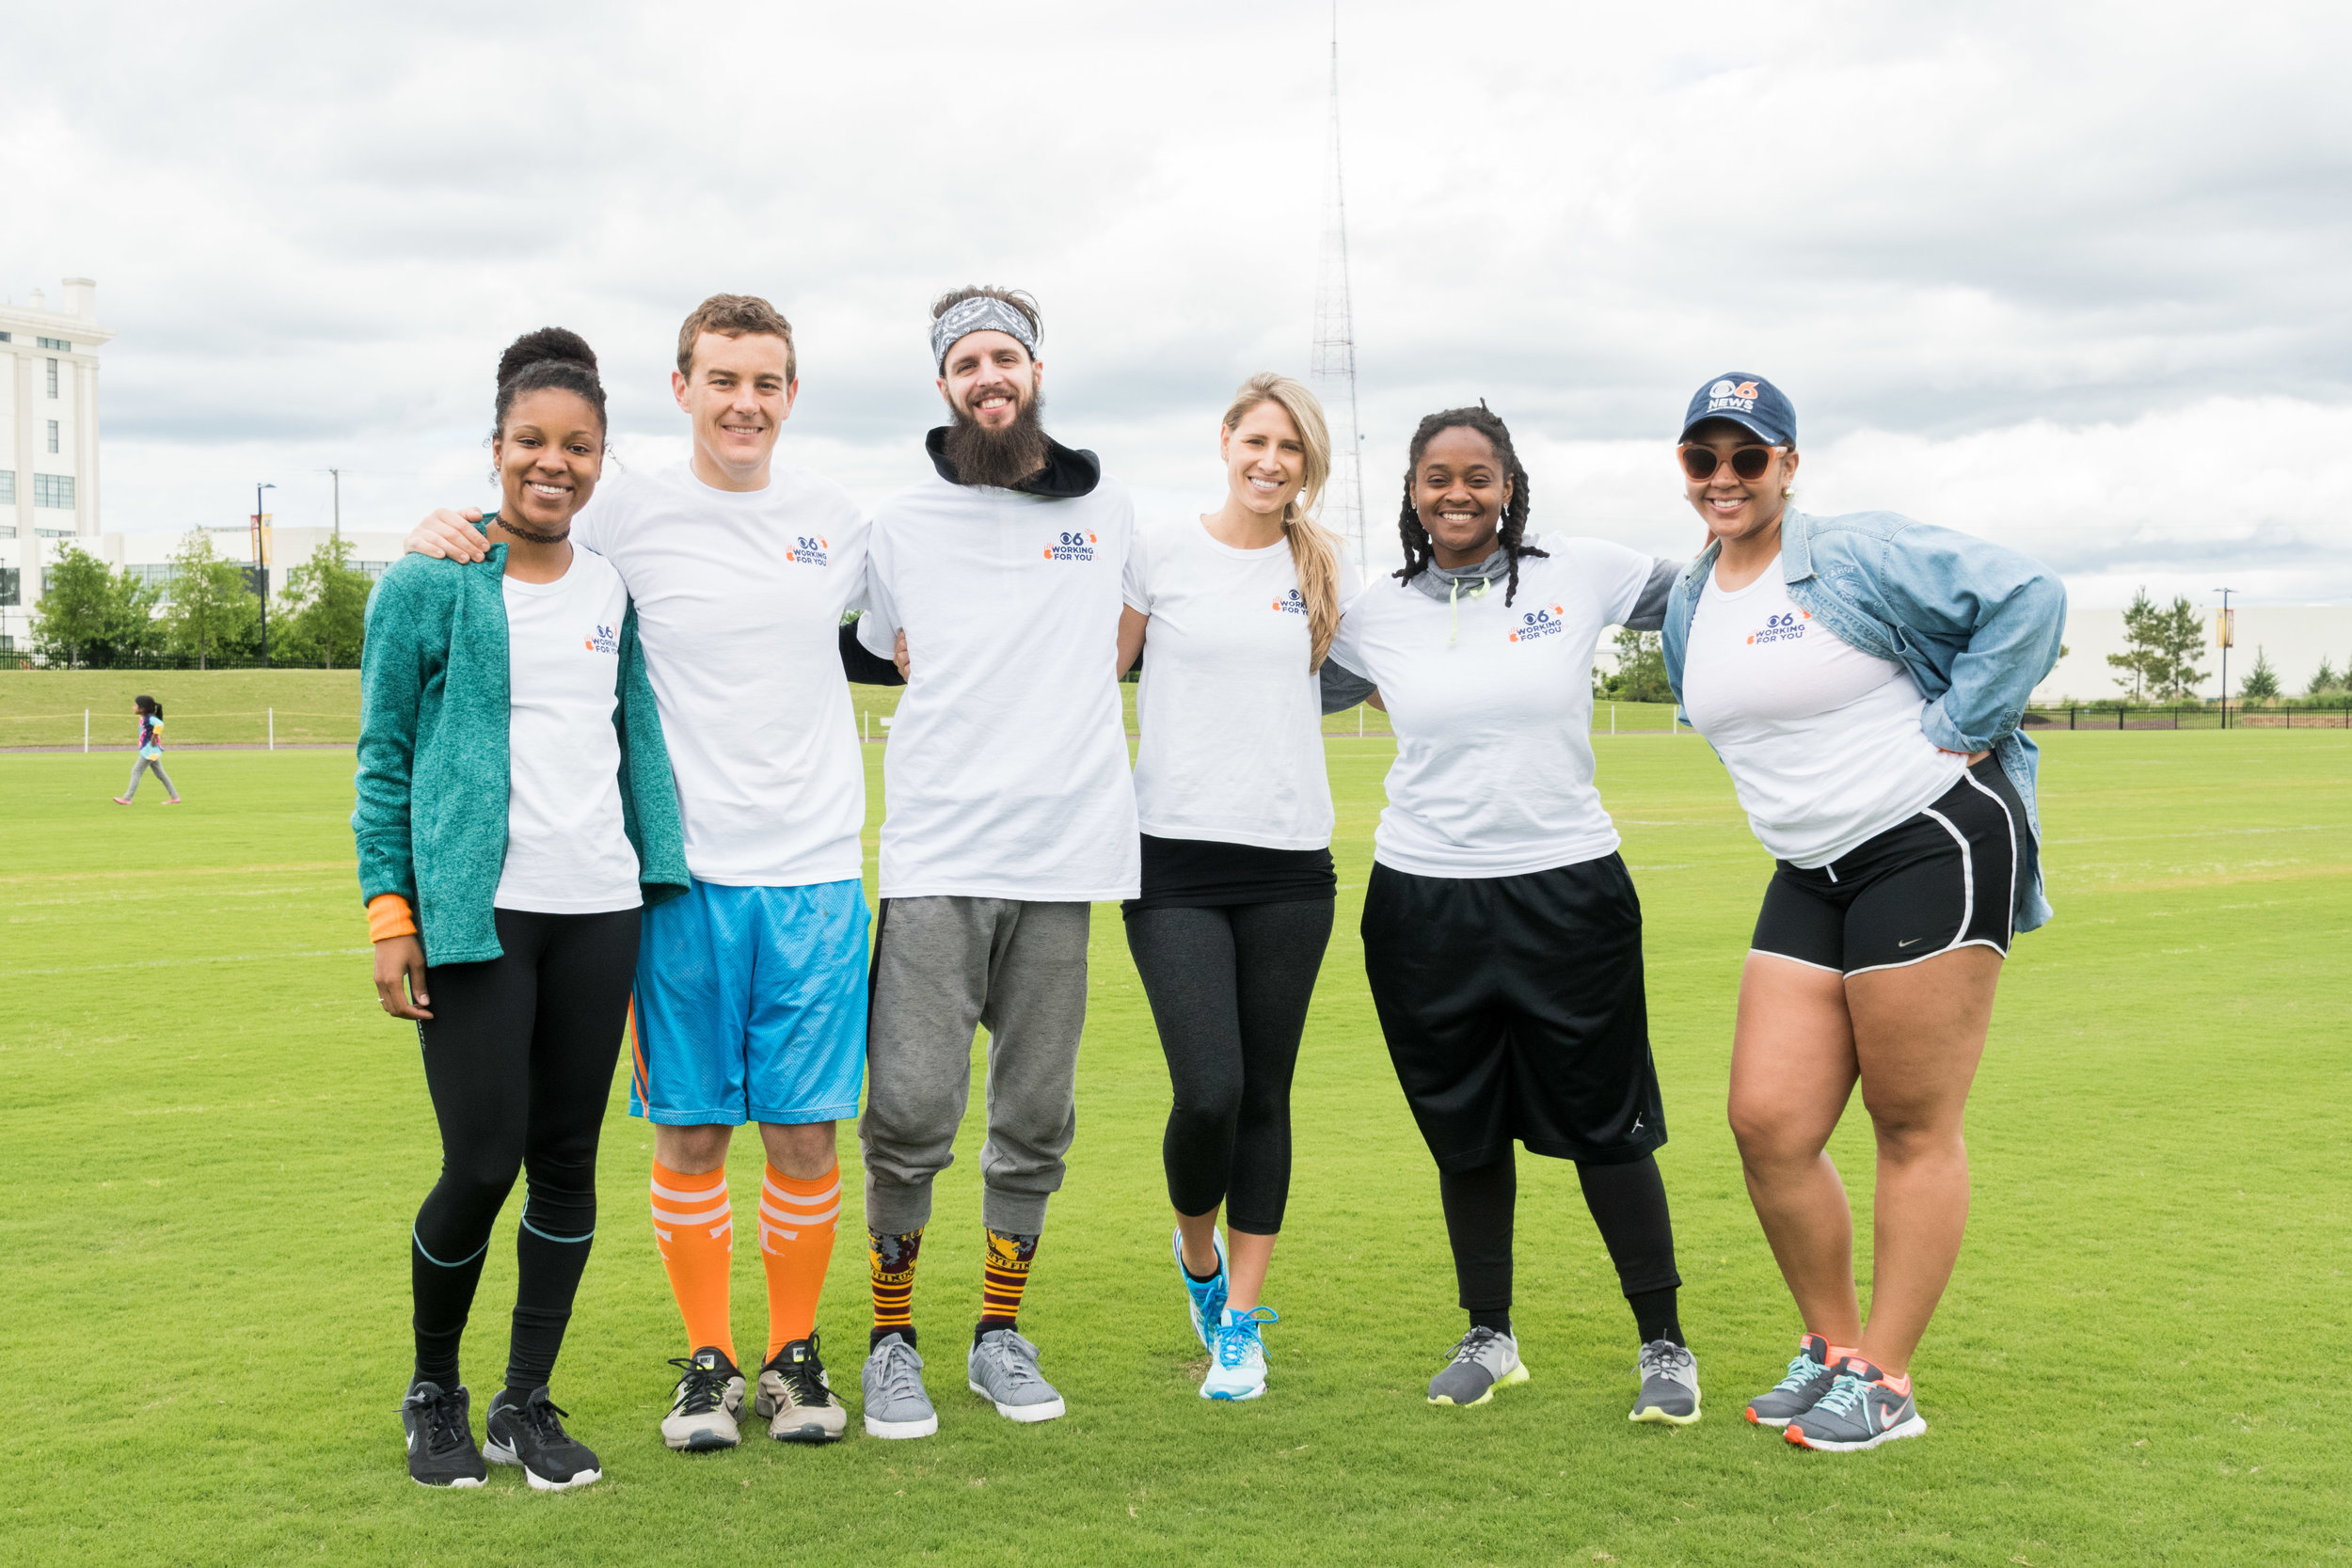 HA Field Day 2017 Teams-5.jpg